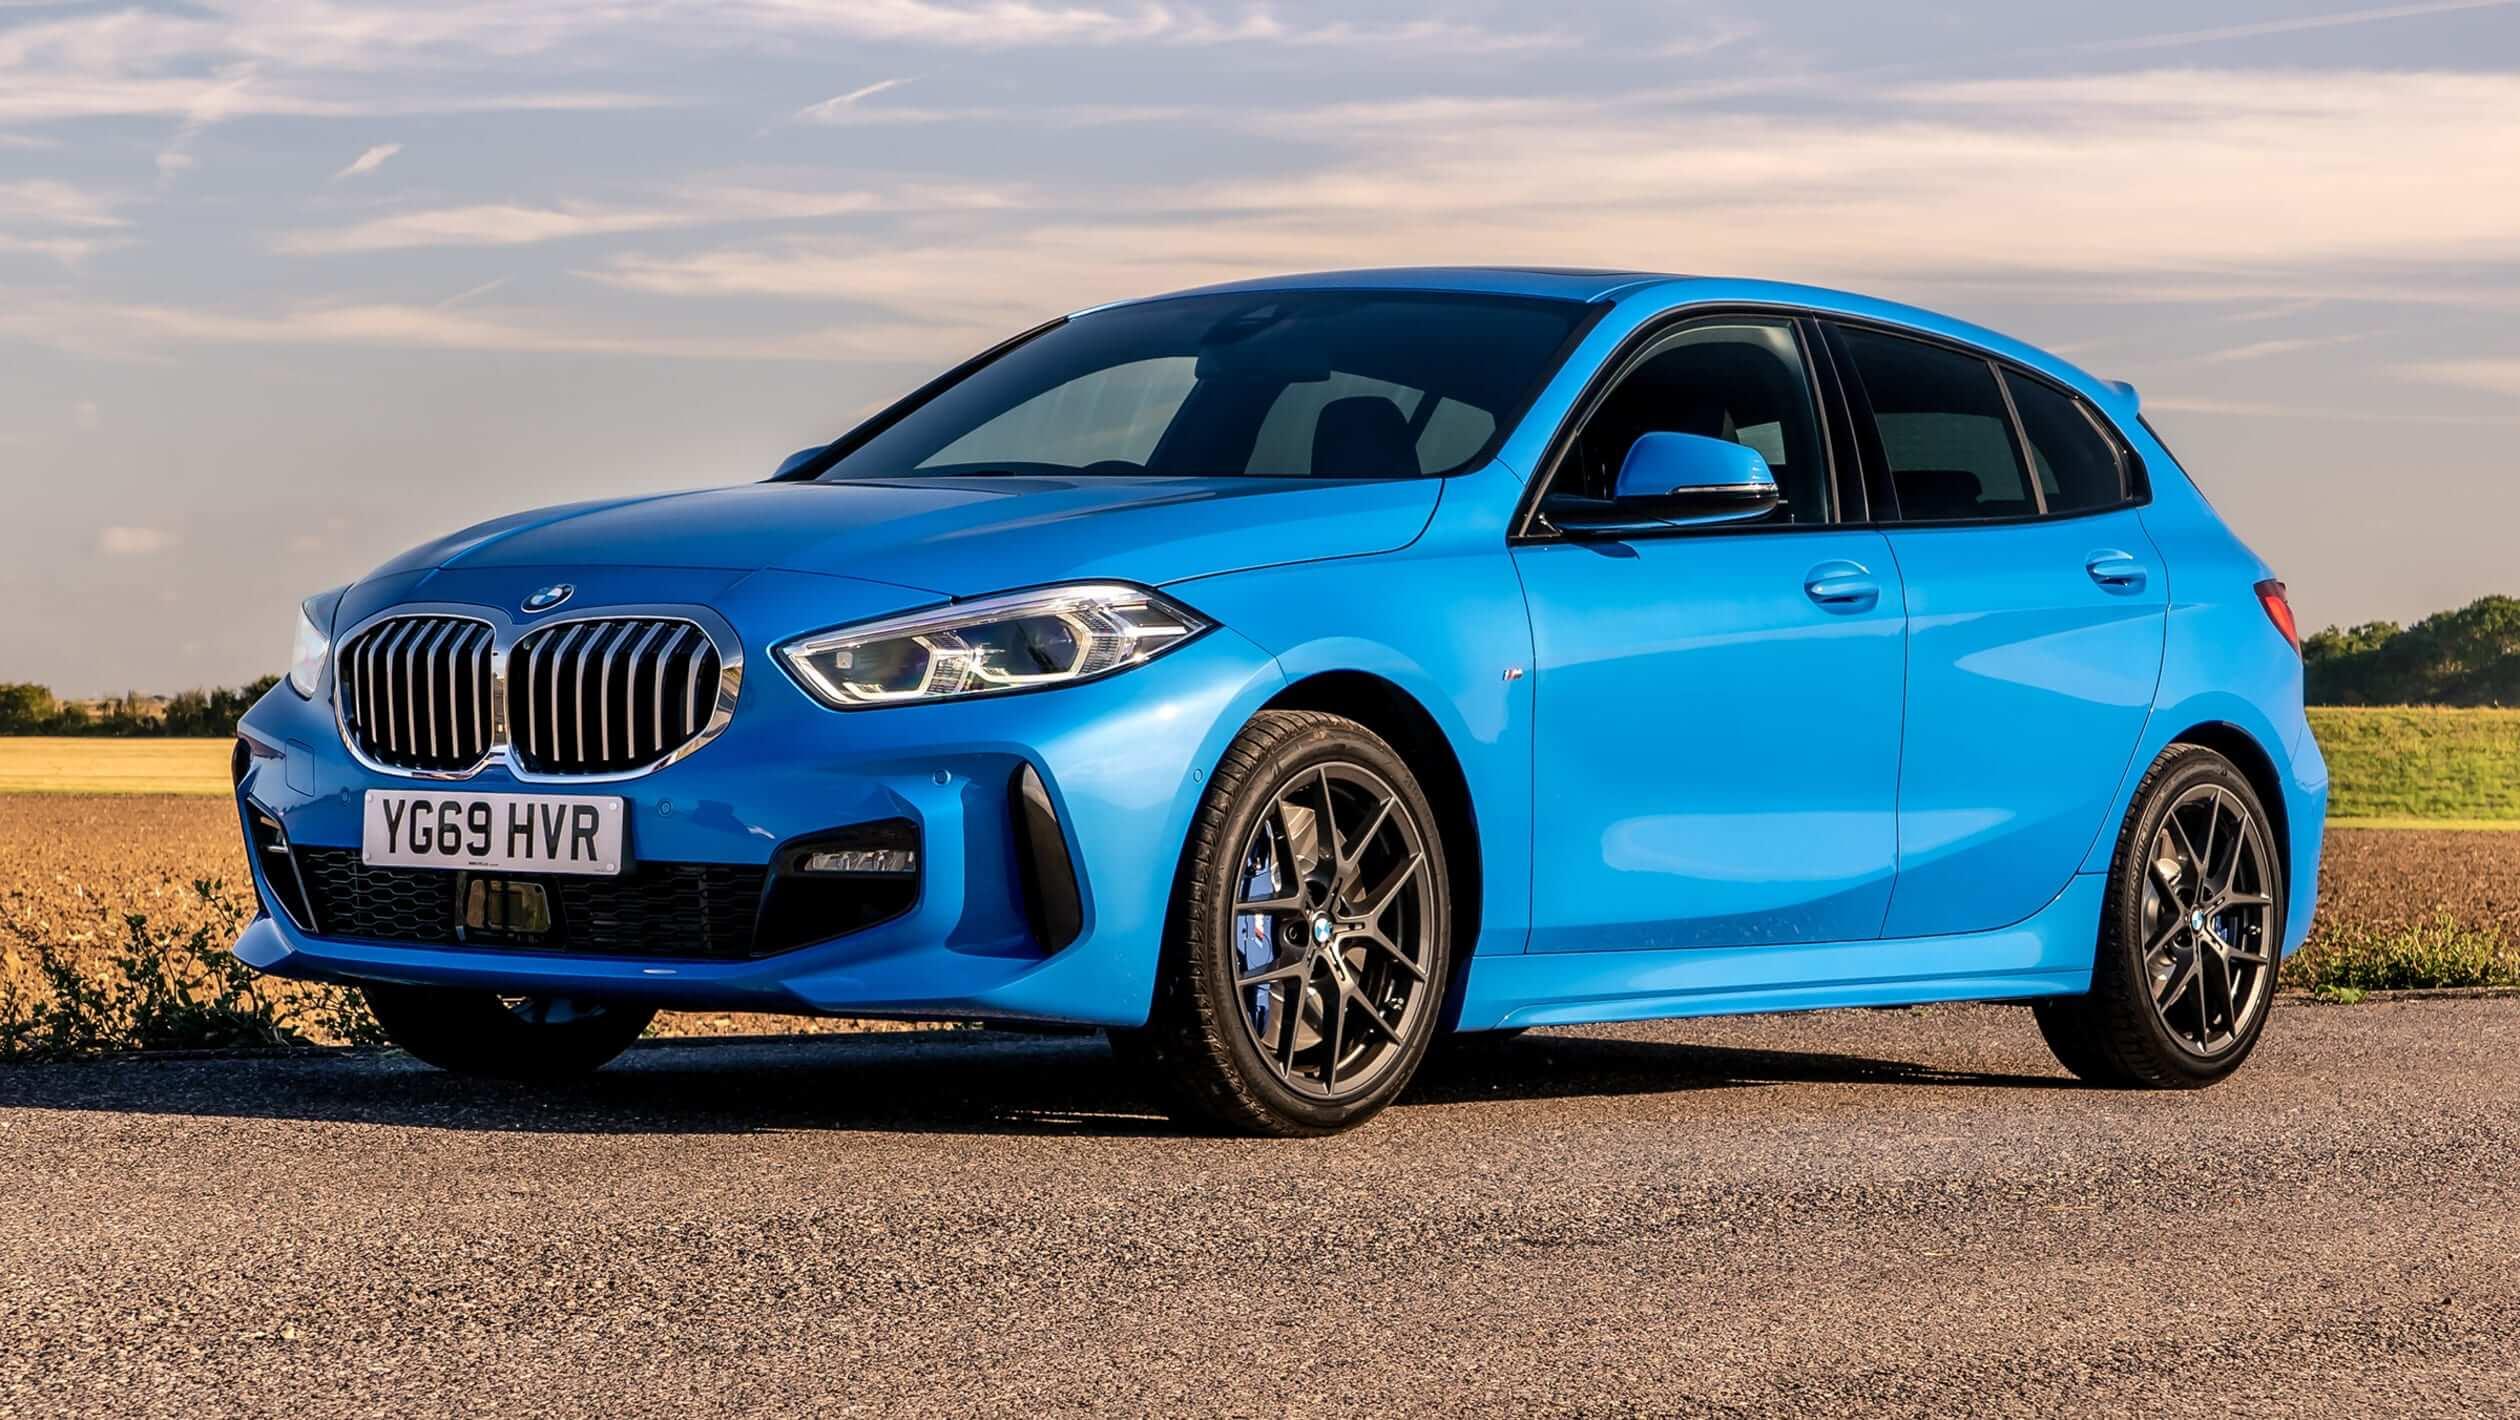 2020 yeni BMW 1 serisi